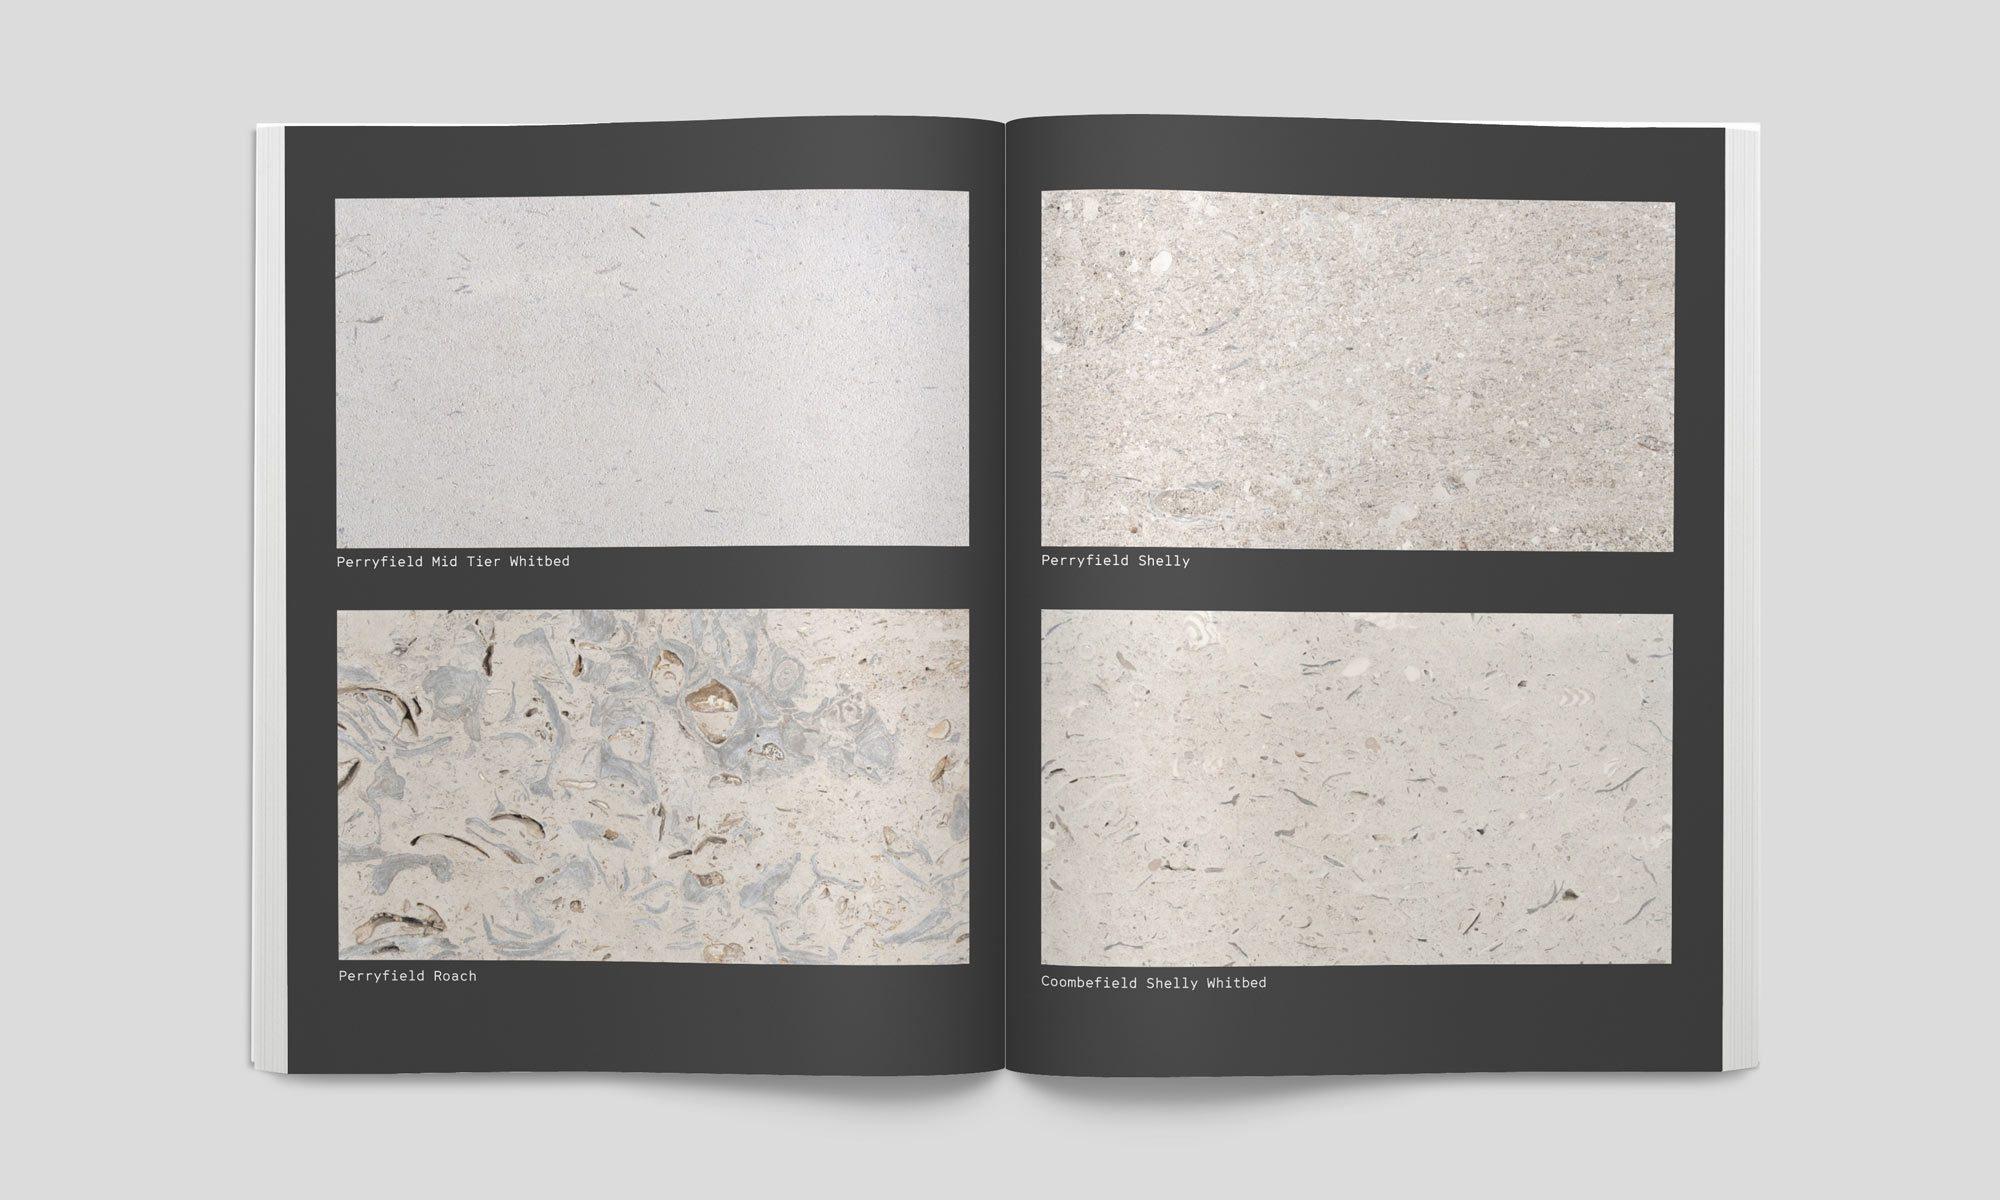 Portland Stone Firms brochure